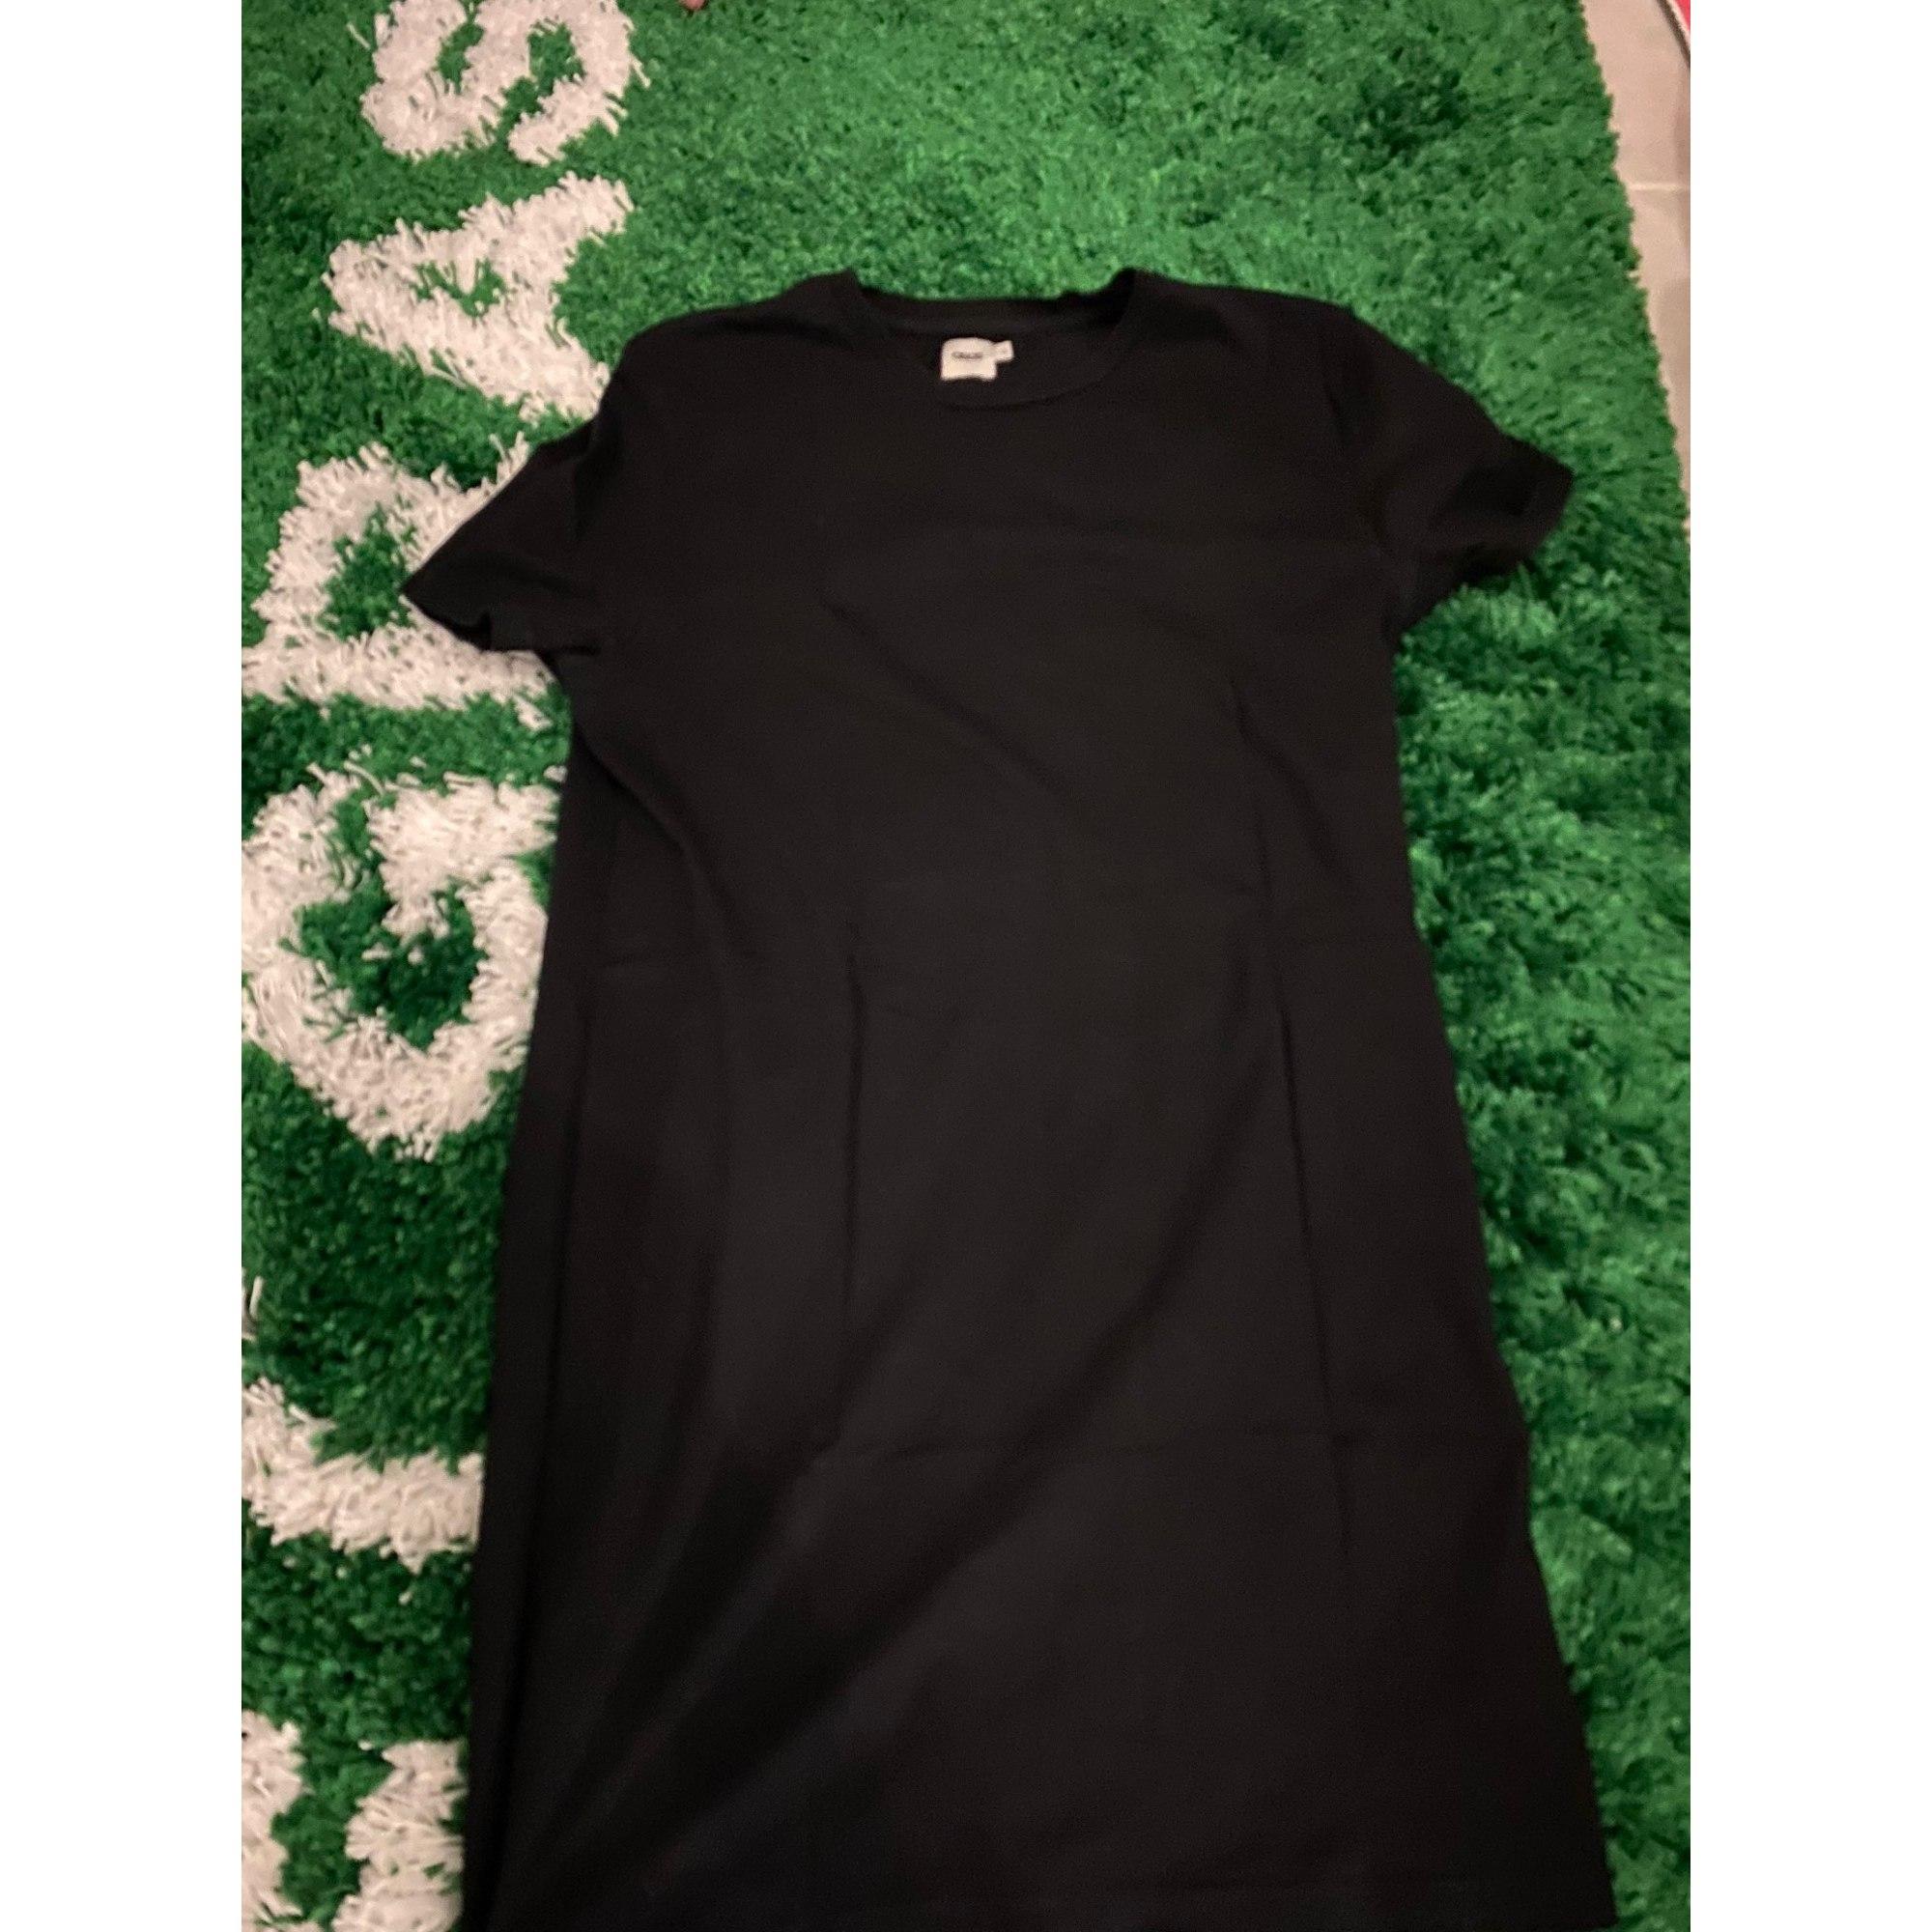 Tee-shirt ASOS Noir